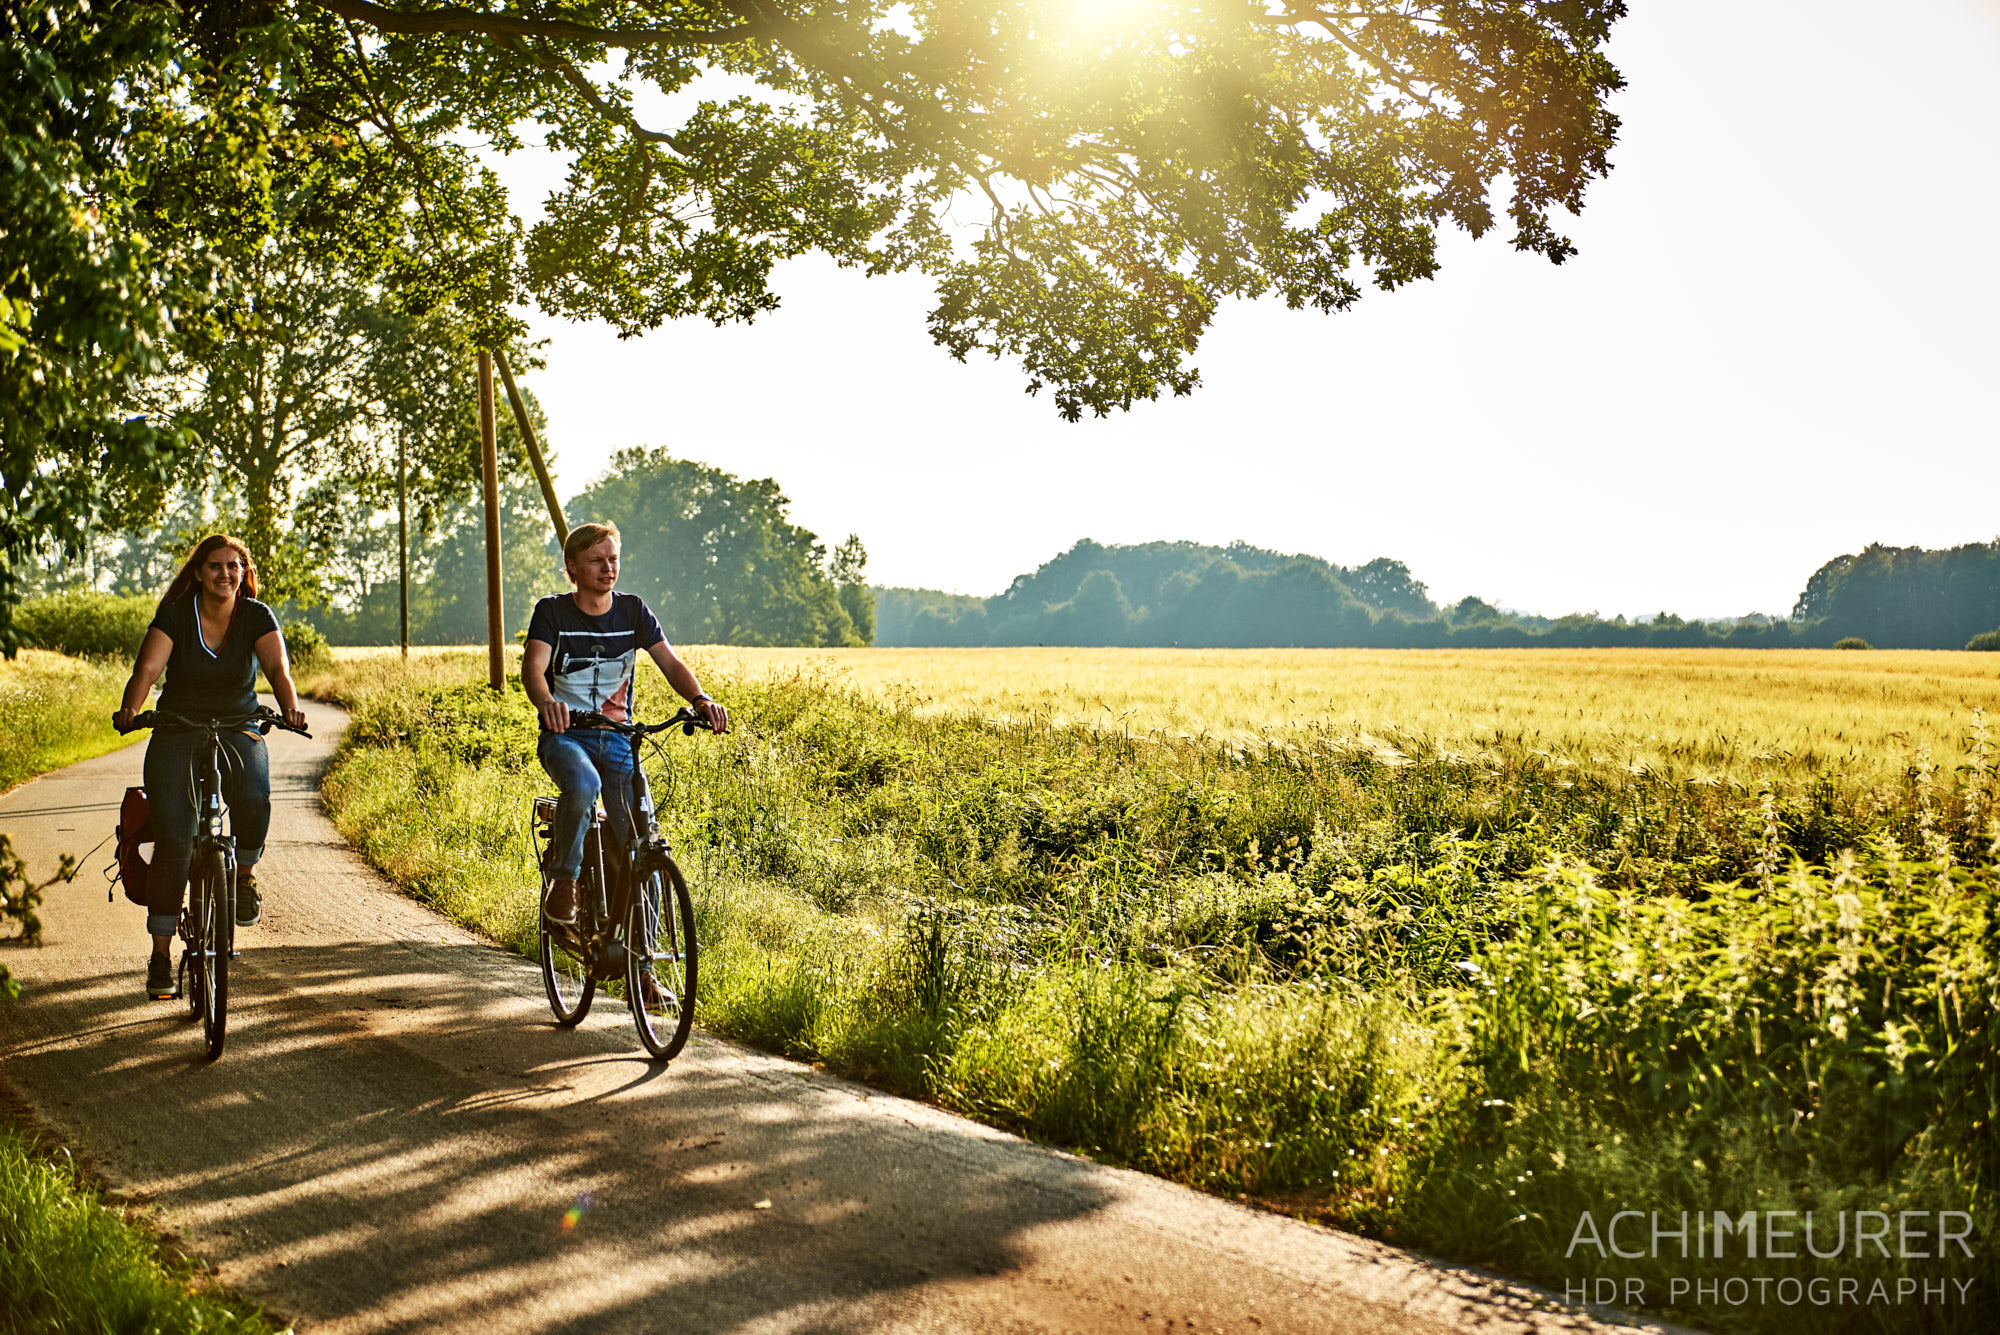 Fahrradtour im Osnabrückerland, Niedersachsen by AchimMeurer.com.